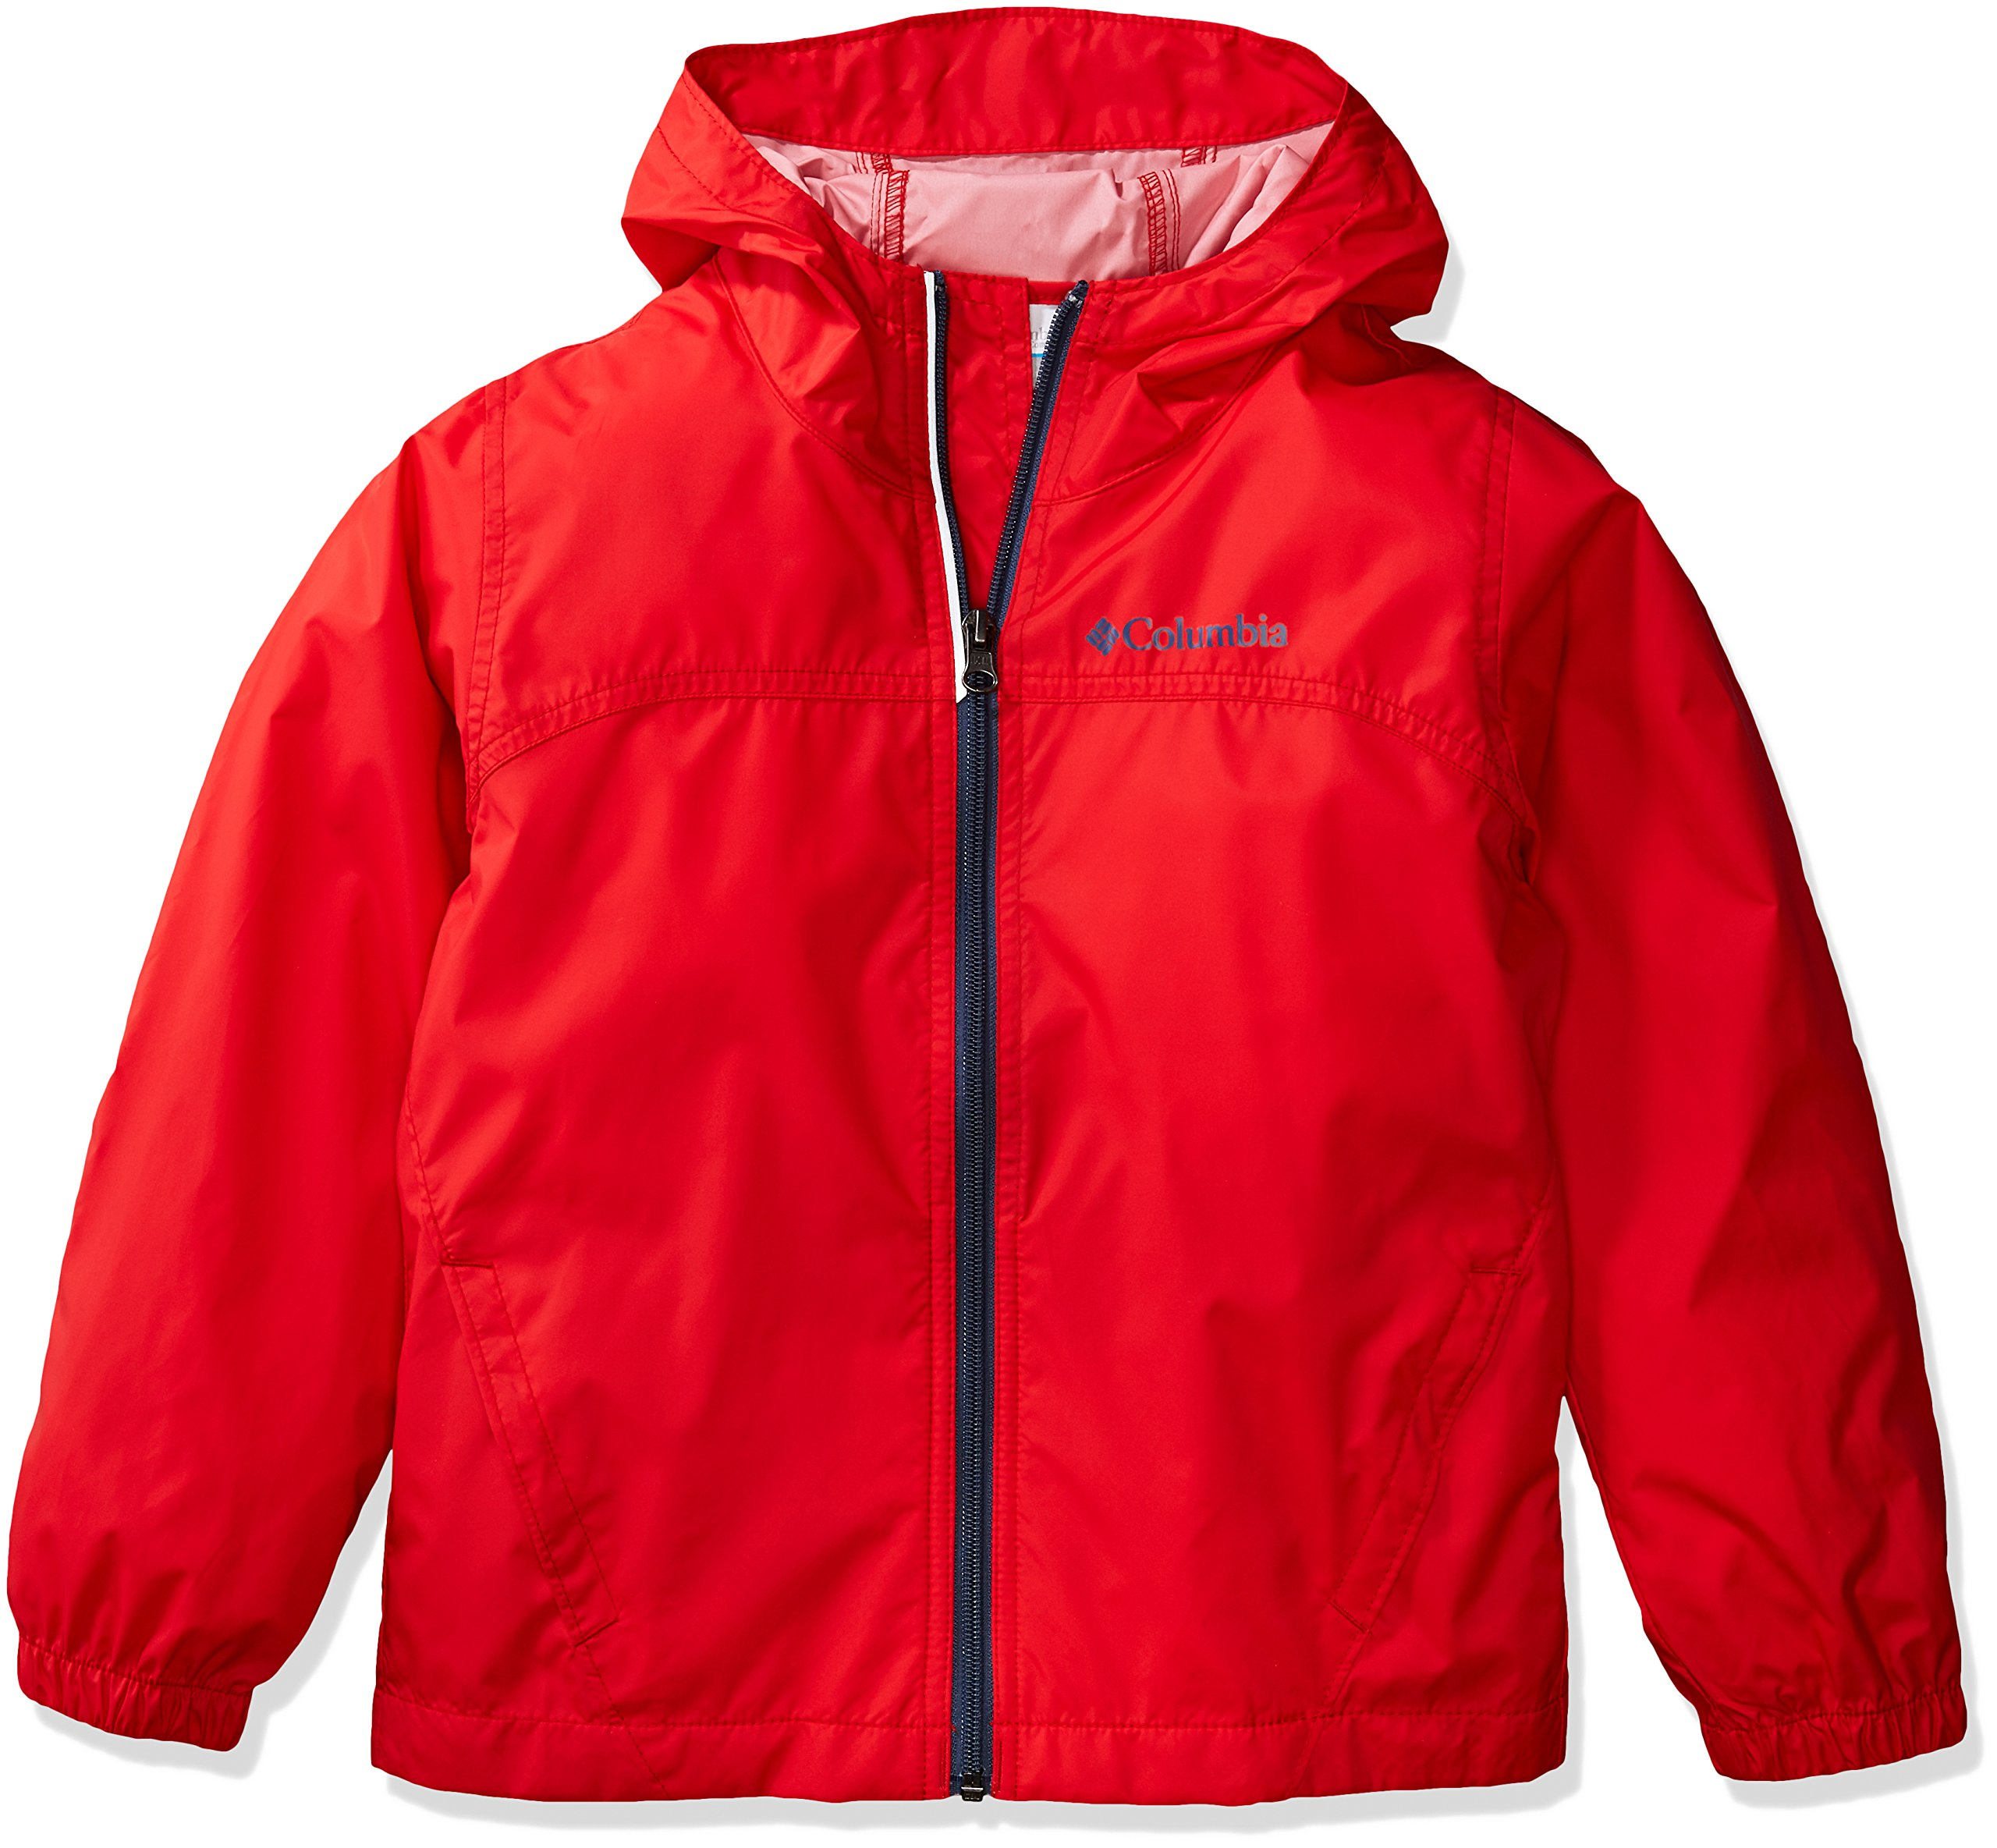 Columbia Boys' Big' Glennaker Rain Jacket, Red Spark, Large